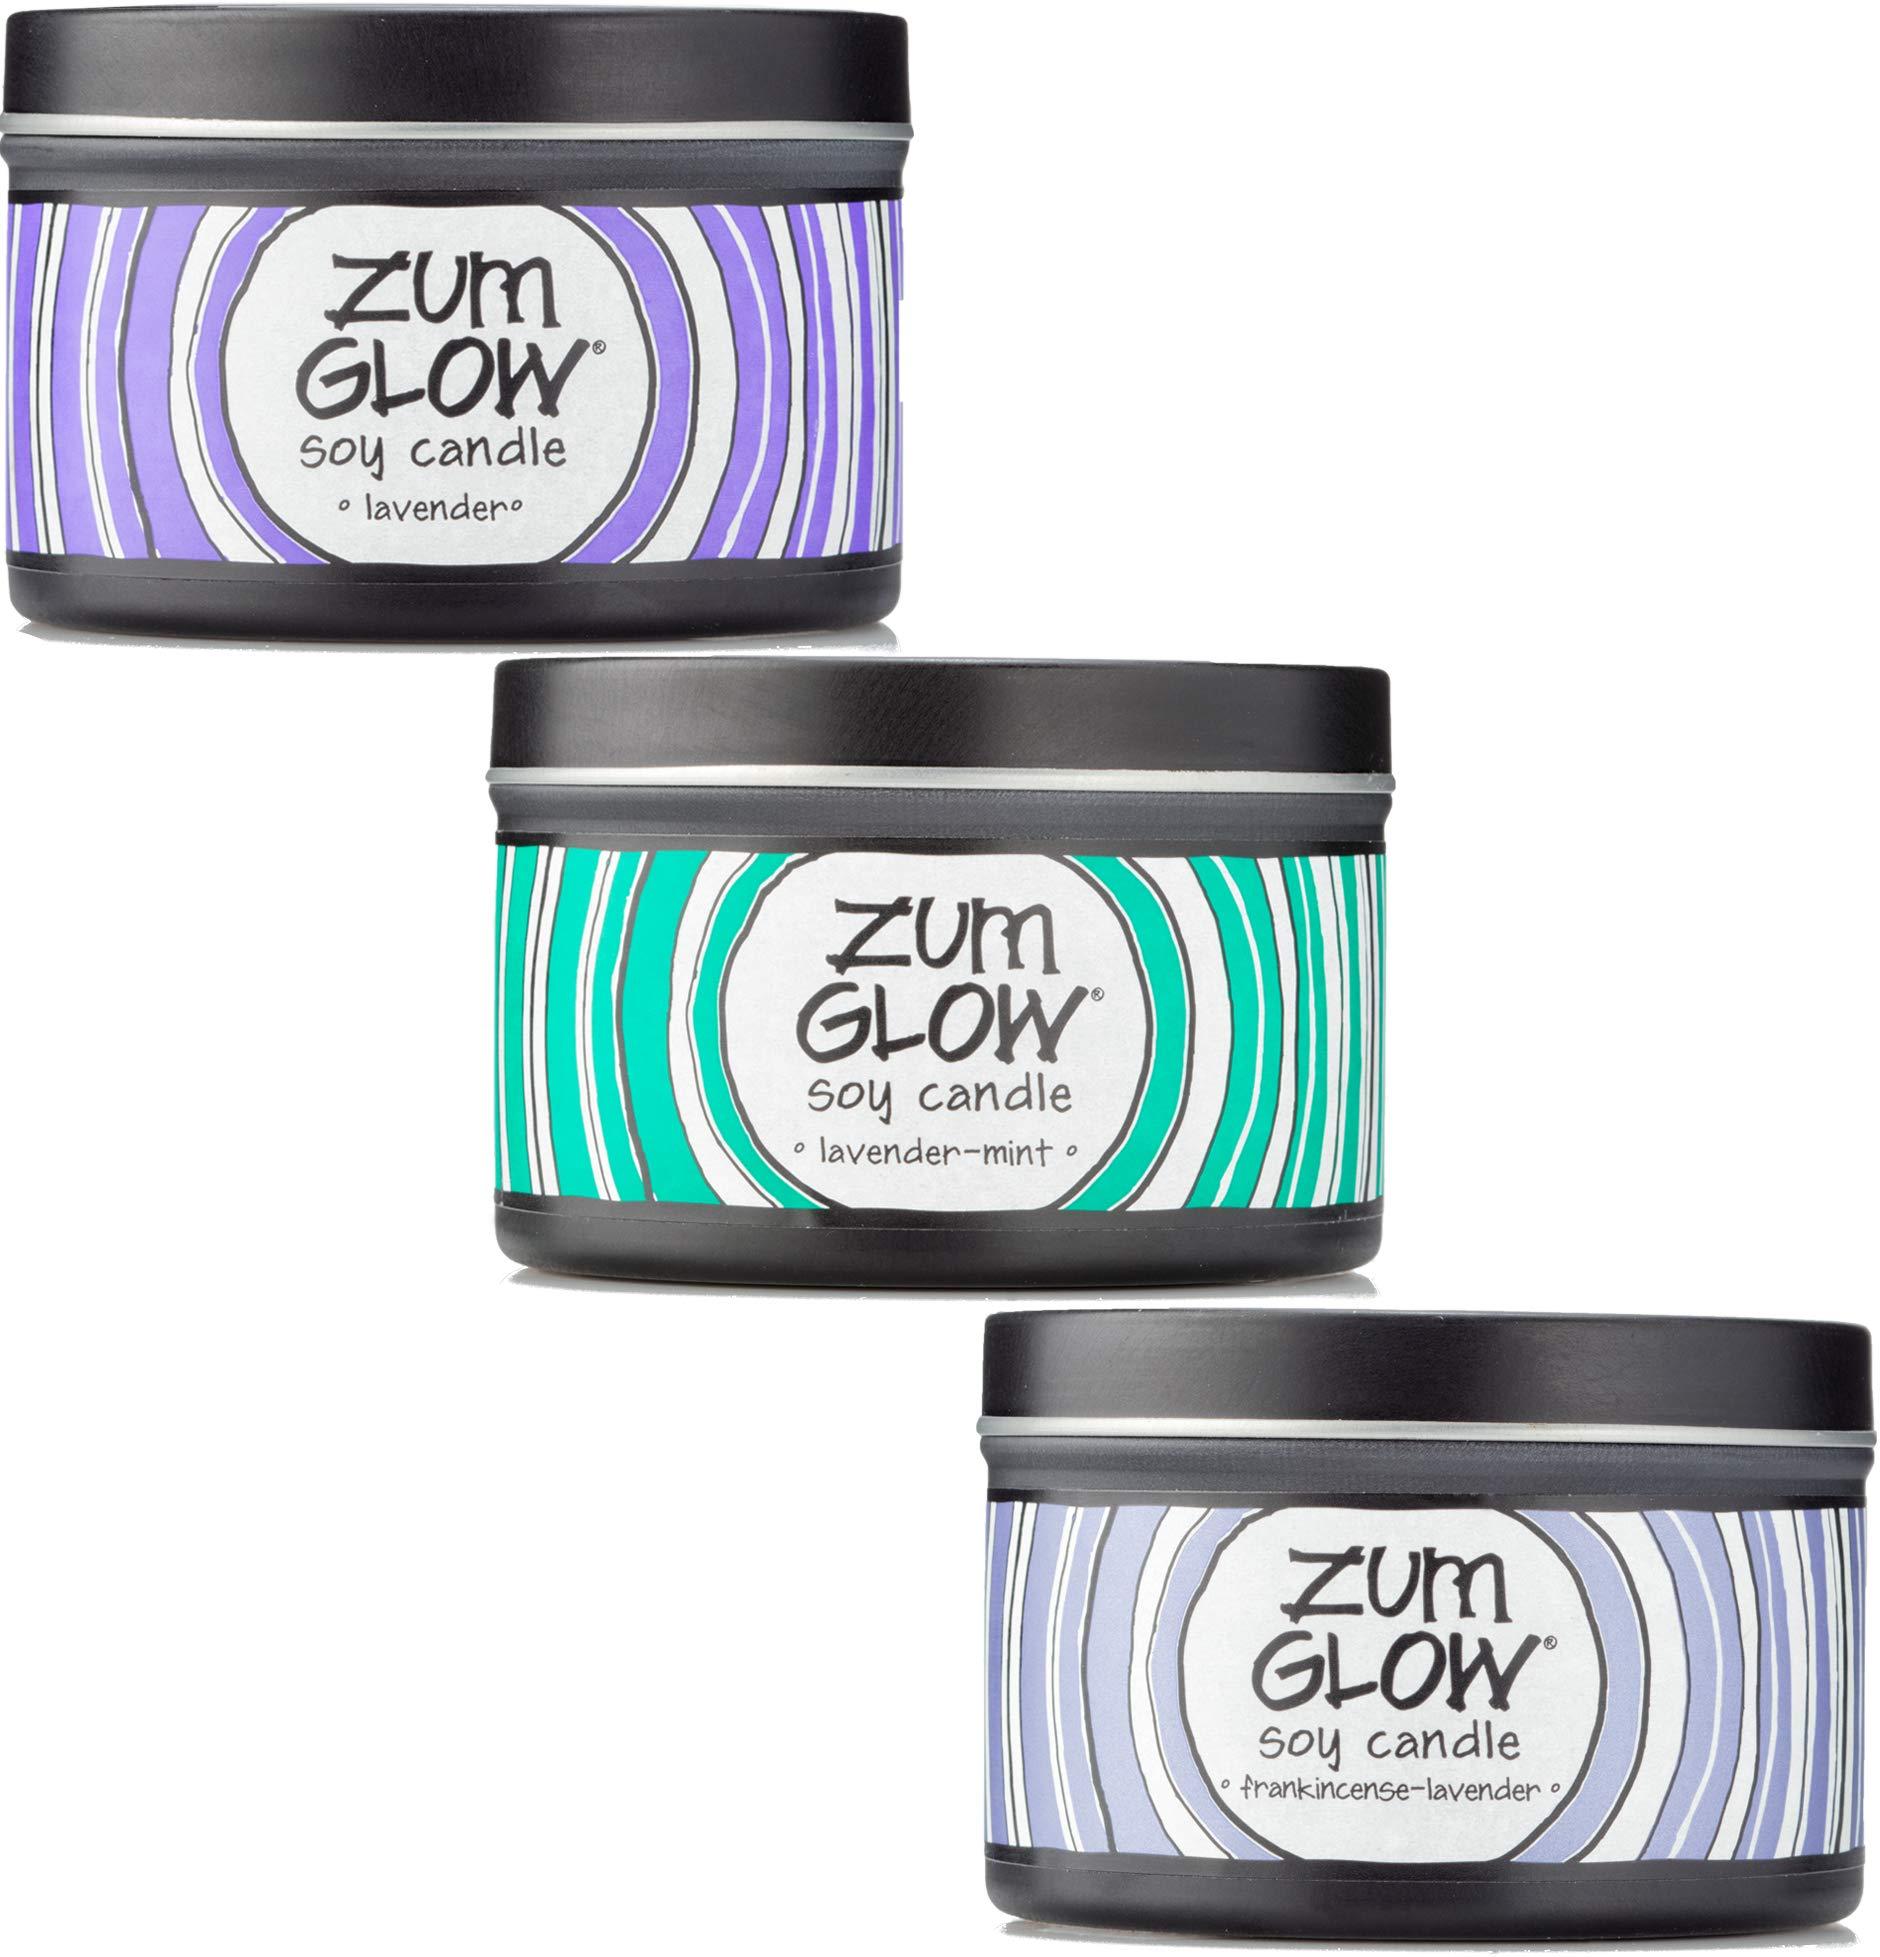 Indigo Wild Zum Glow Aromatherapy Soy Candles Set, 7oz: Lavender, Lavender-Mint, Frankincense-Lavender by Indigo Wild